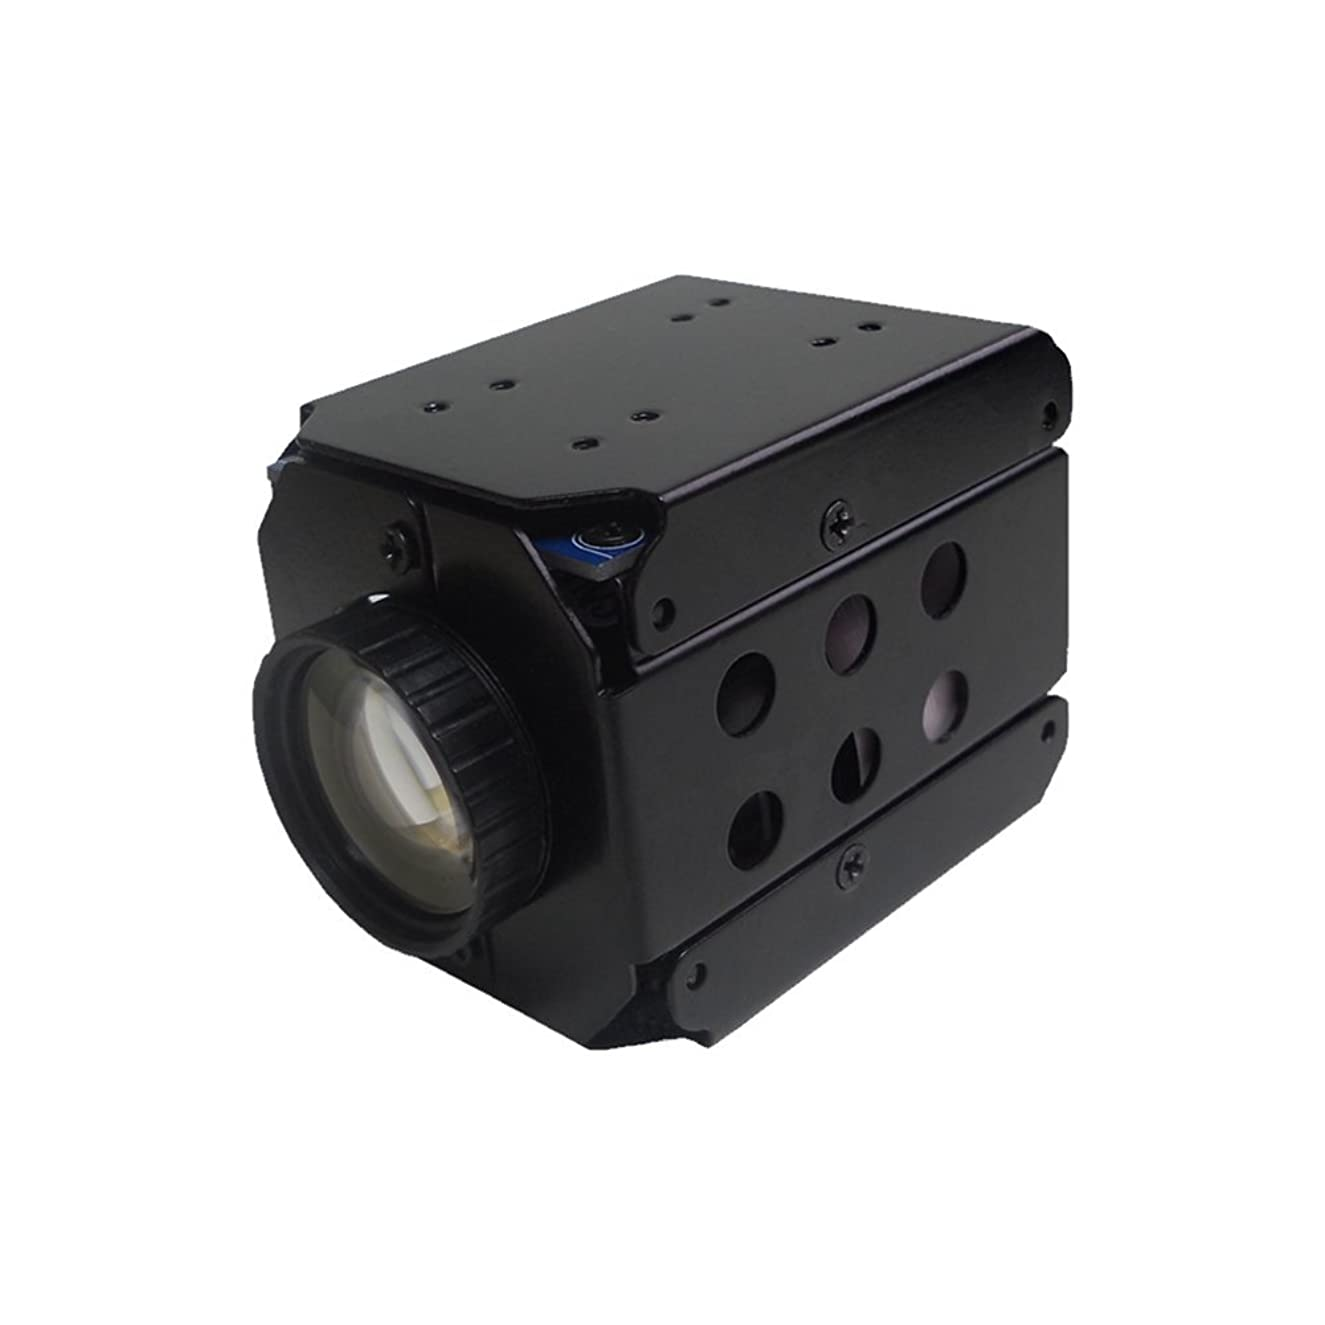 Marviosafer 1080P Starlight Full HD 18X Optical Zoom Security IP PTZ Camera CCTV Module 0.0001Lux CMOS Sensor Onvif, Support Pelco-P Pelco-D ETC (Starlight 18X Zoom)